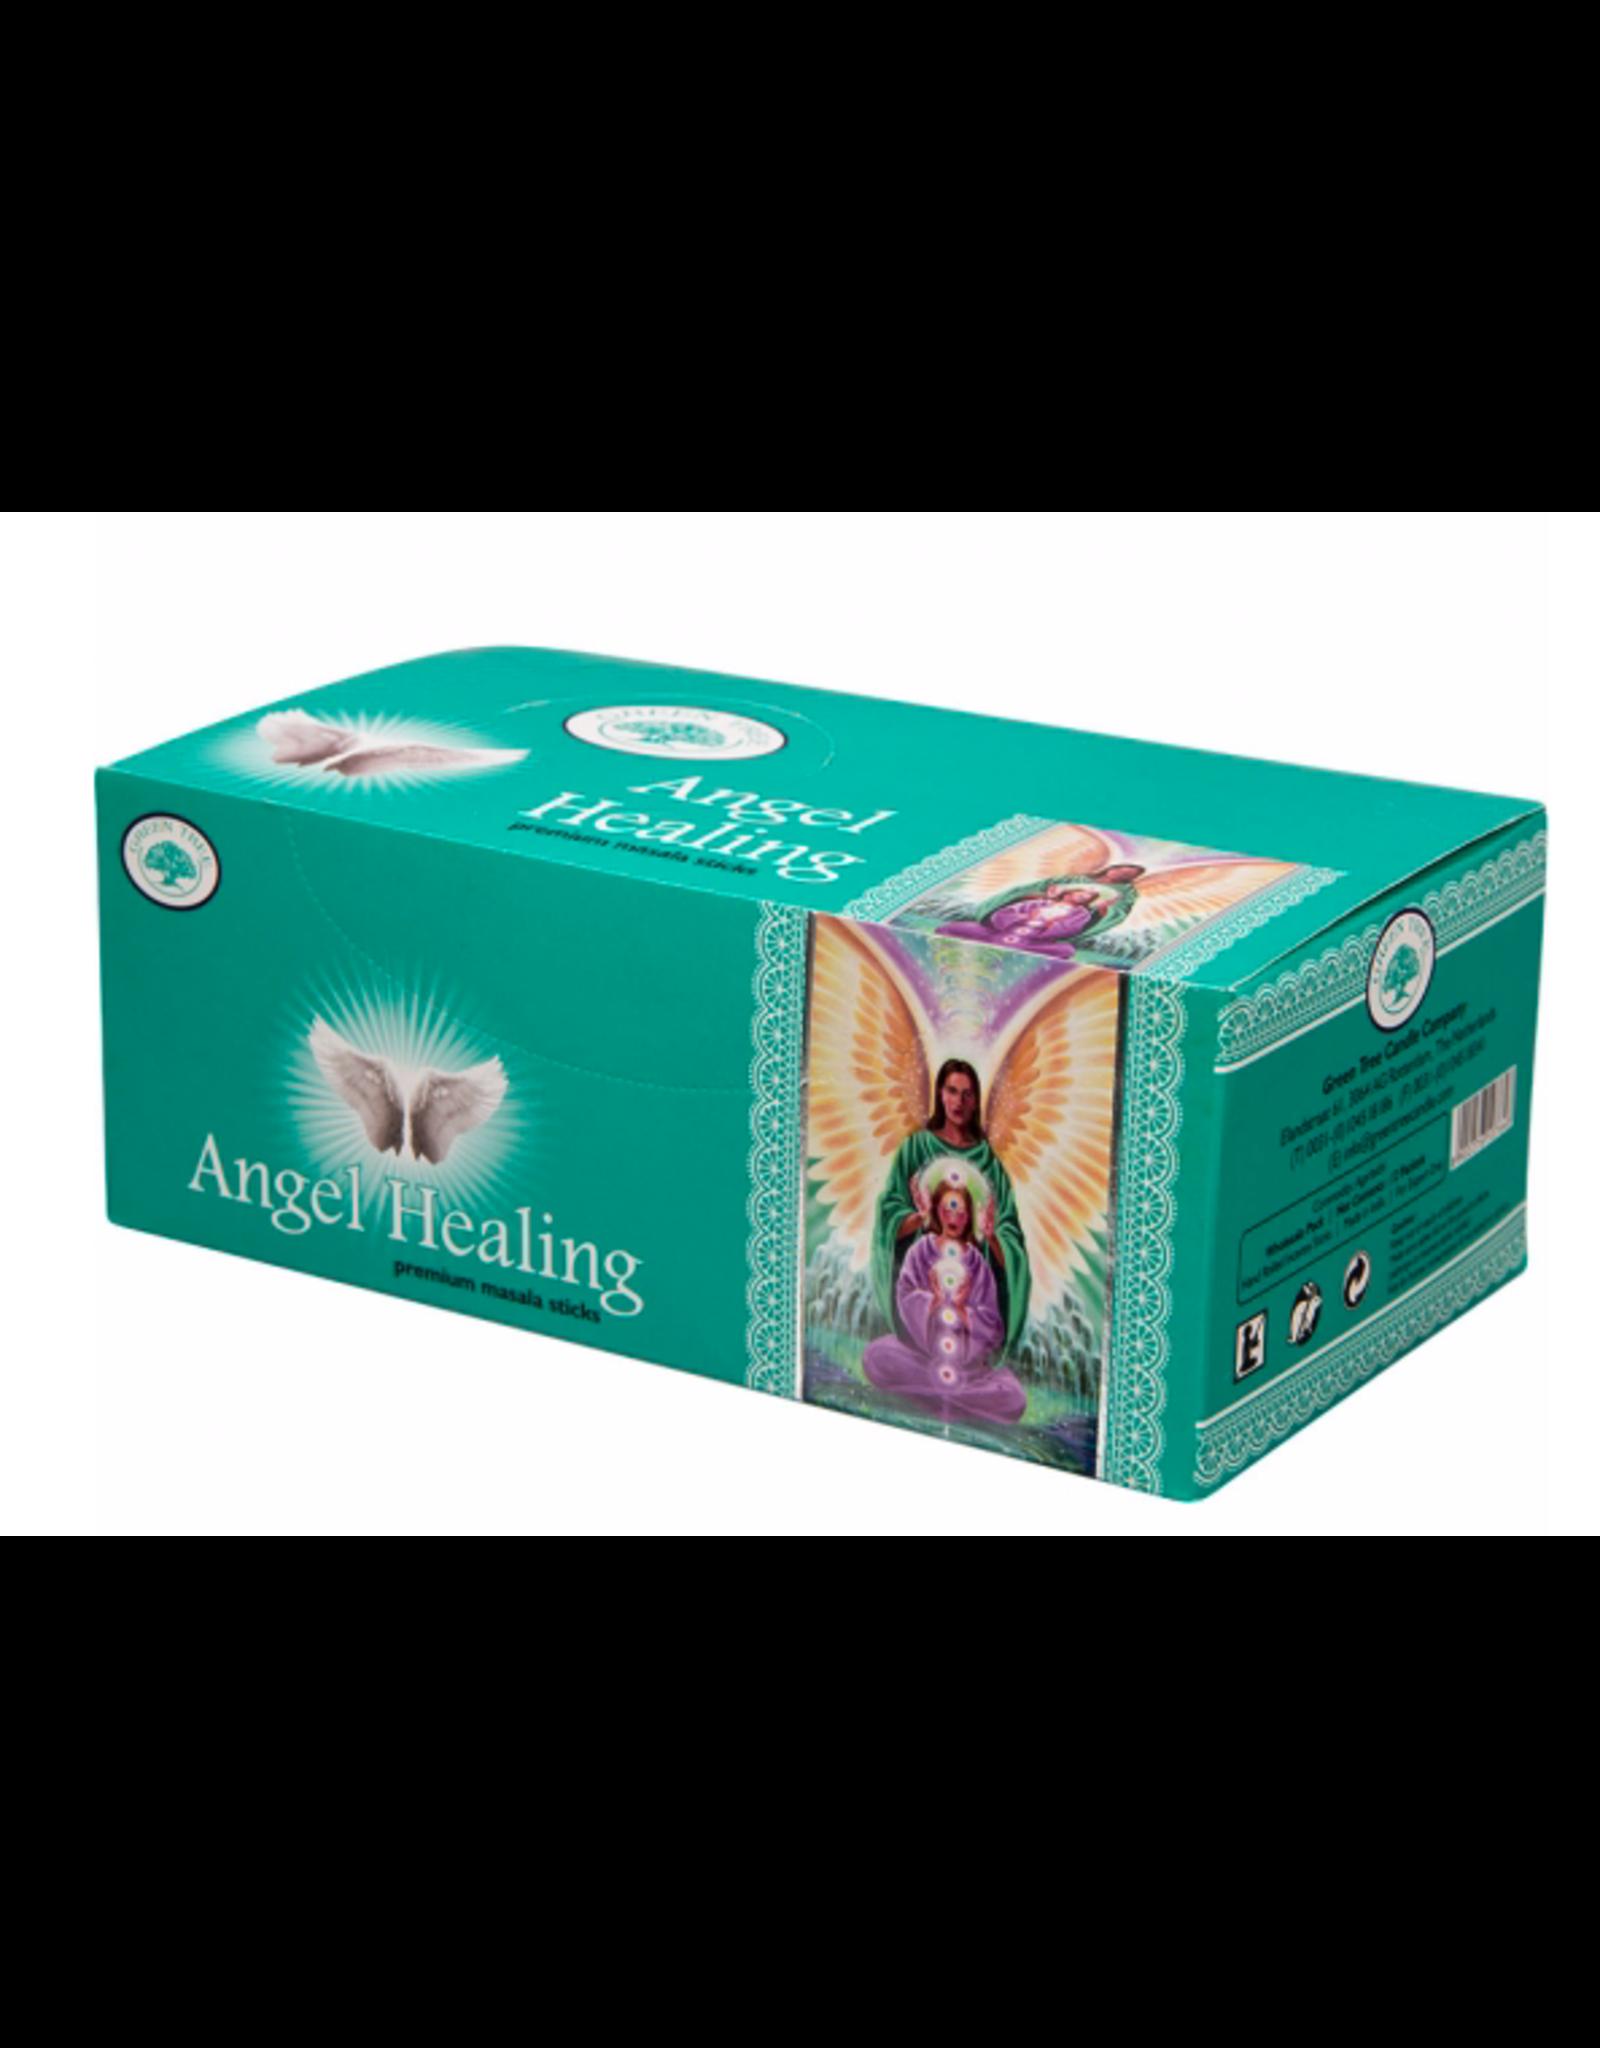 Angel Healing Incense Box - Sticks